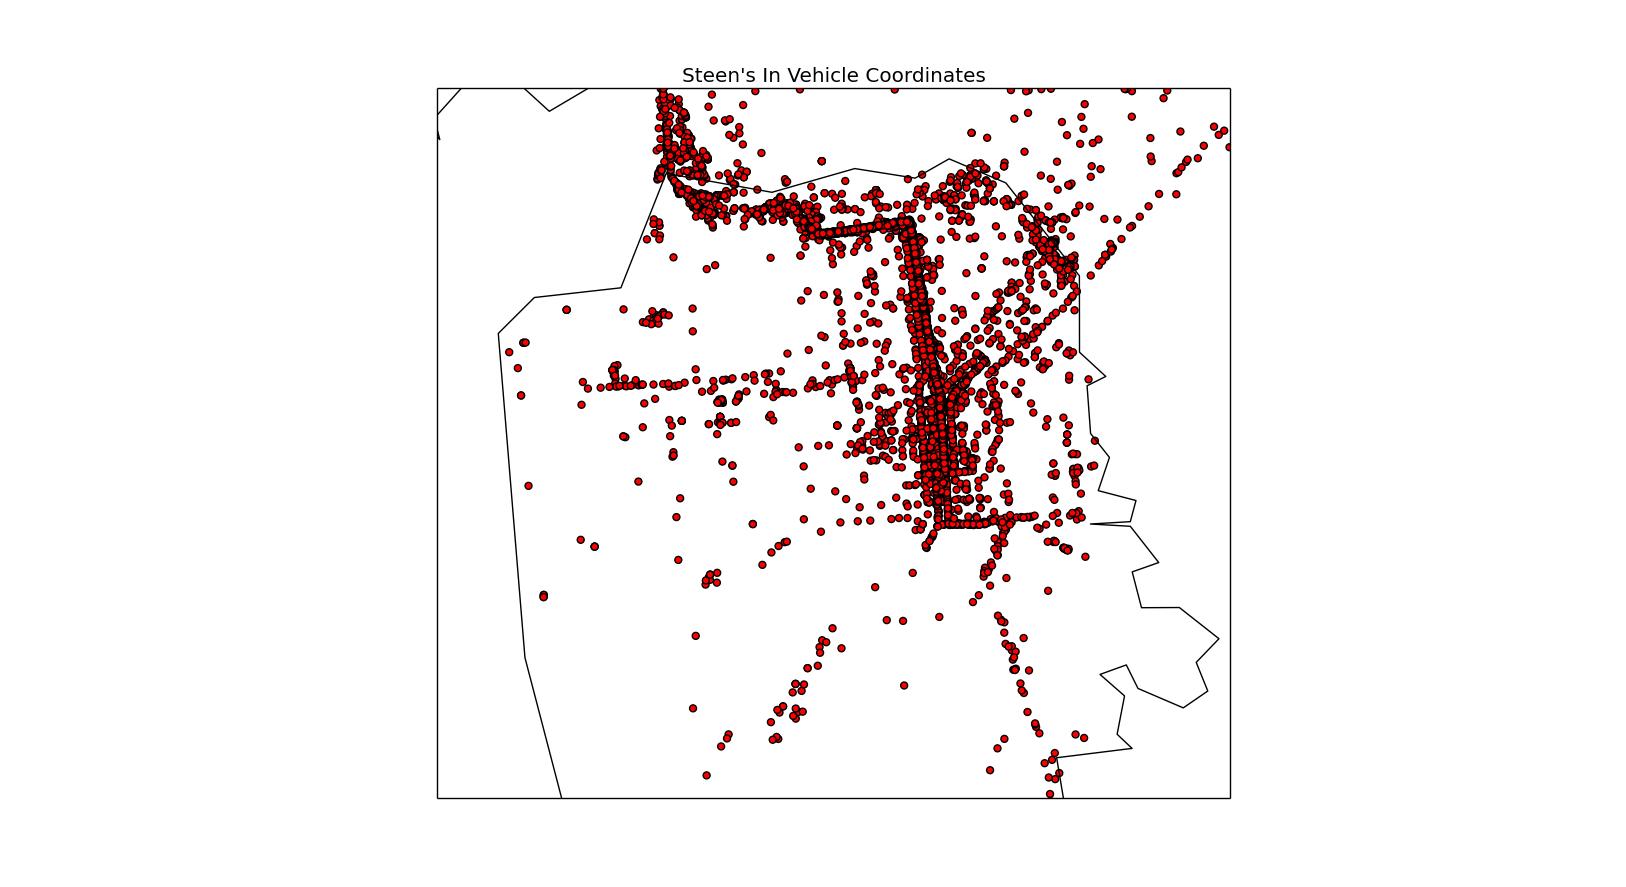 More Google Location Data | Certainly Strange